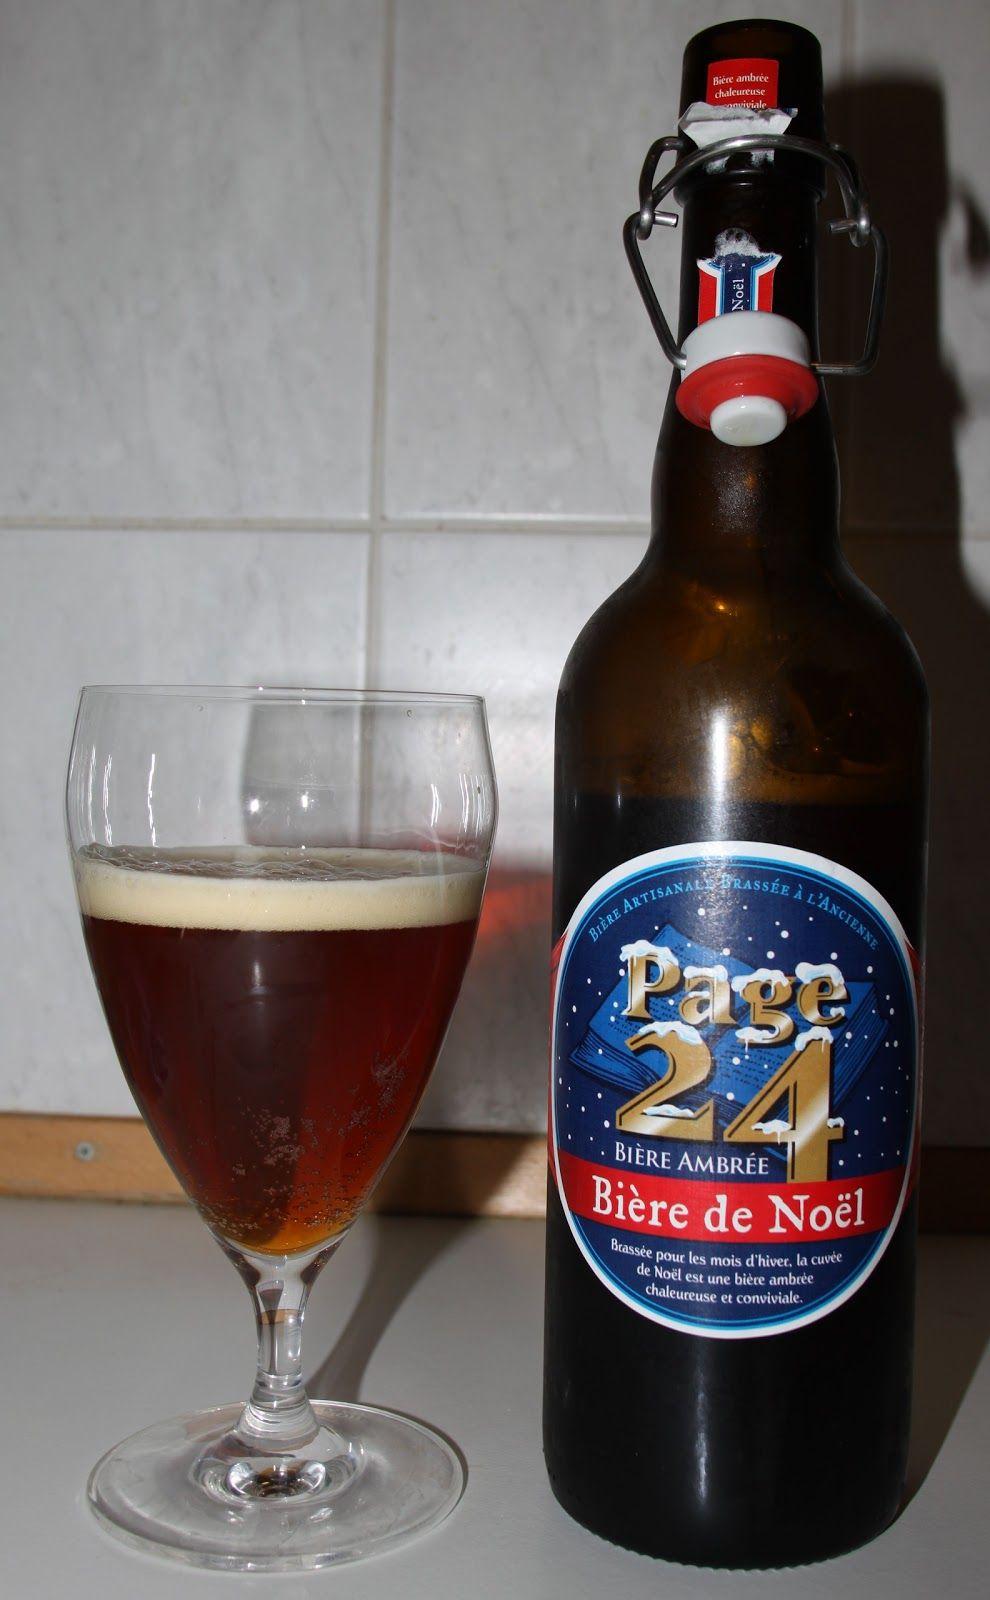 Brasserie St. Germain - Page 24 Biere De Noel 6,9% 75cl pullo (Joulupäivä 25.12.2008) (1/2 Teron kanssa HBF 20.4.2013)